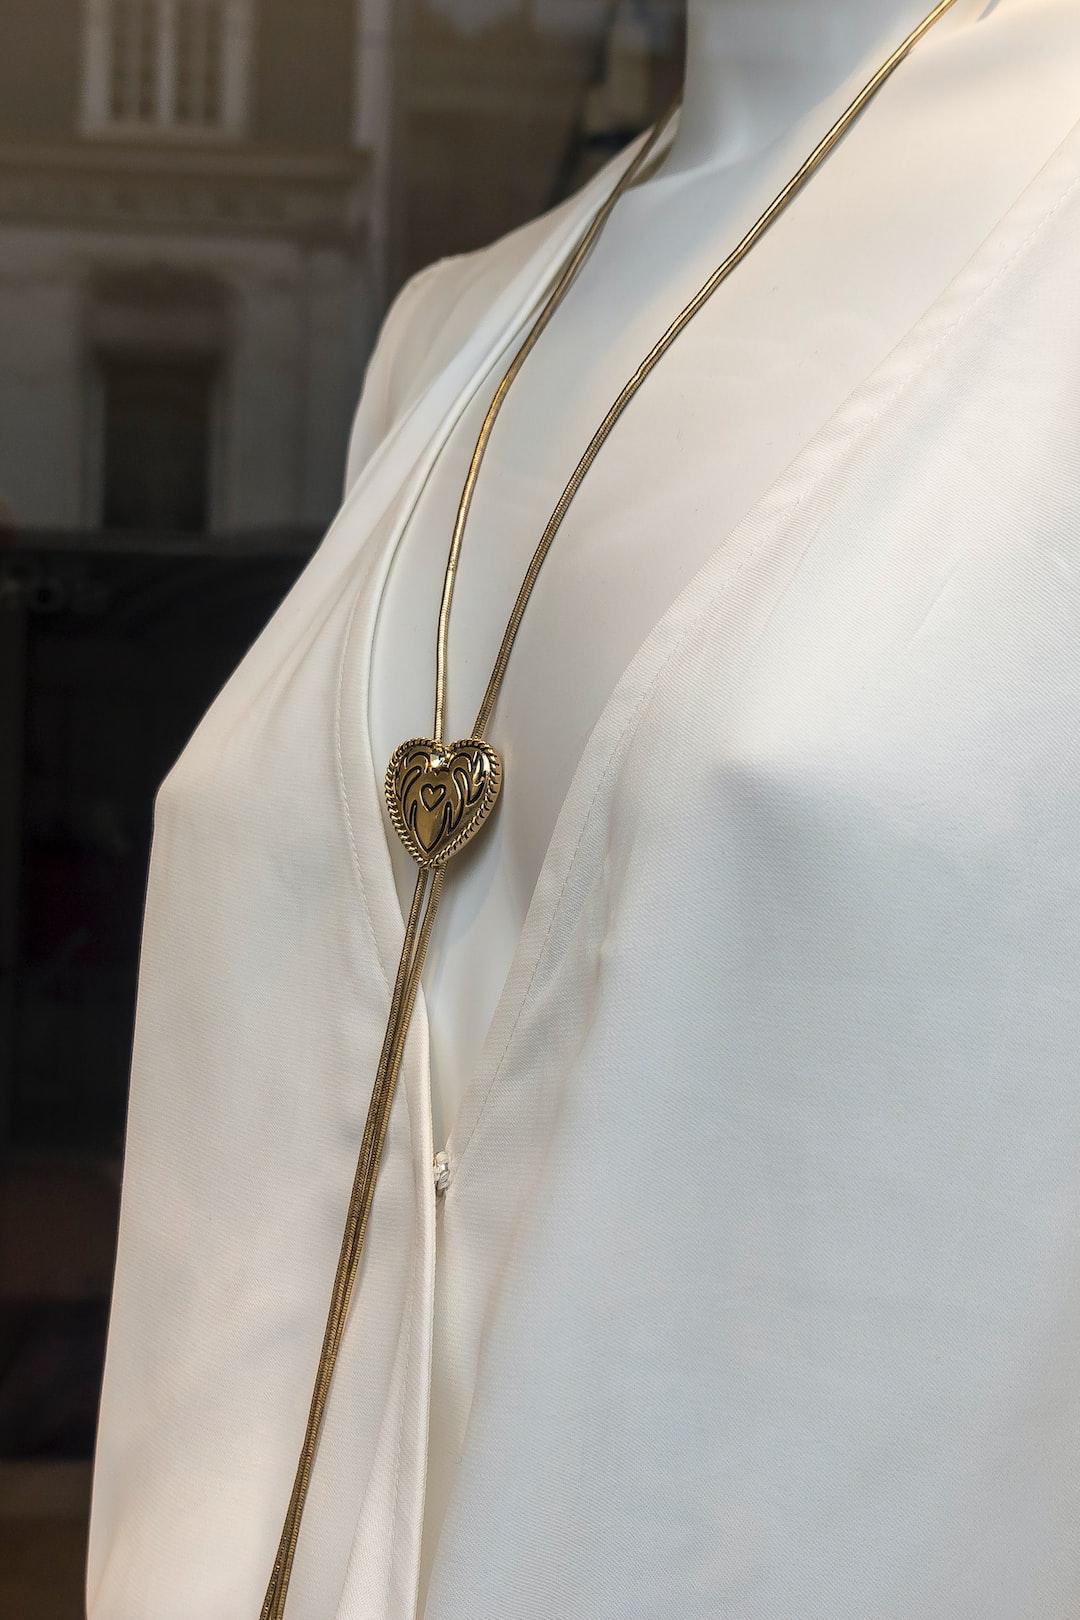 etalage: luxurious jewelery